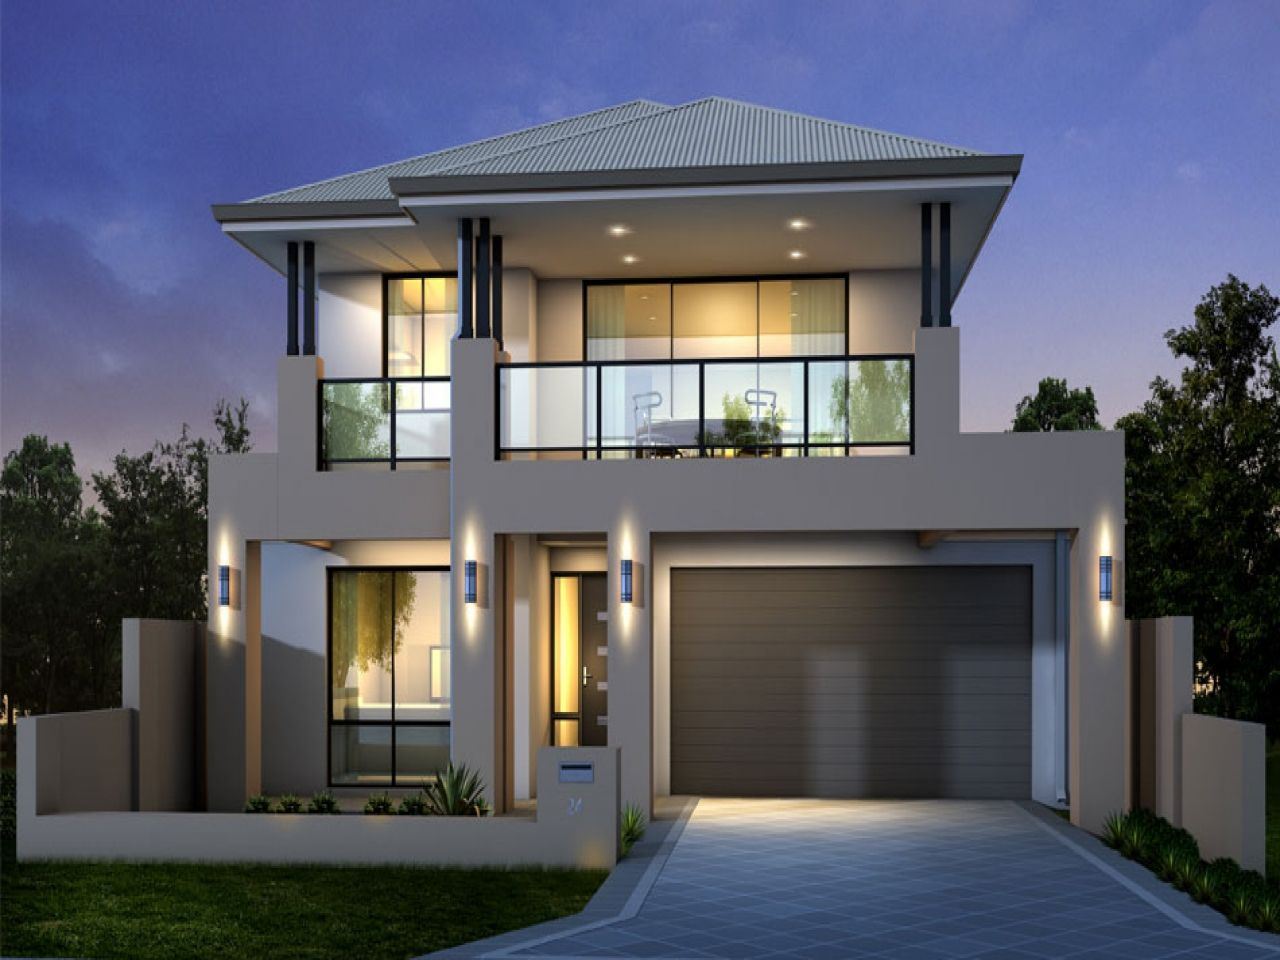 ICYMI Small House Design Philippines Cost Современный